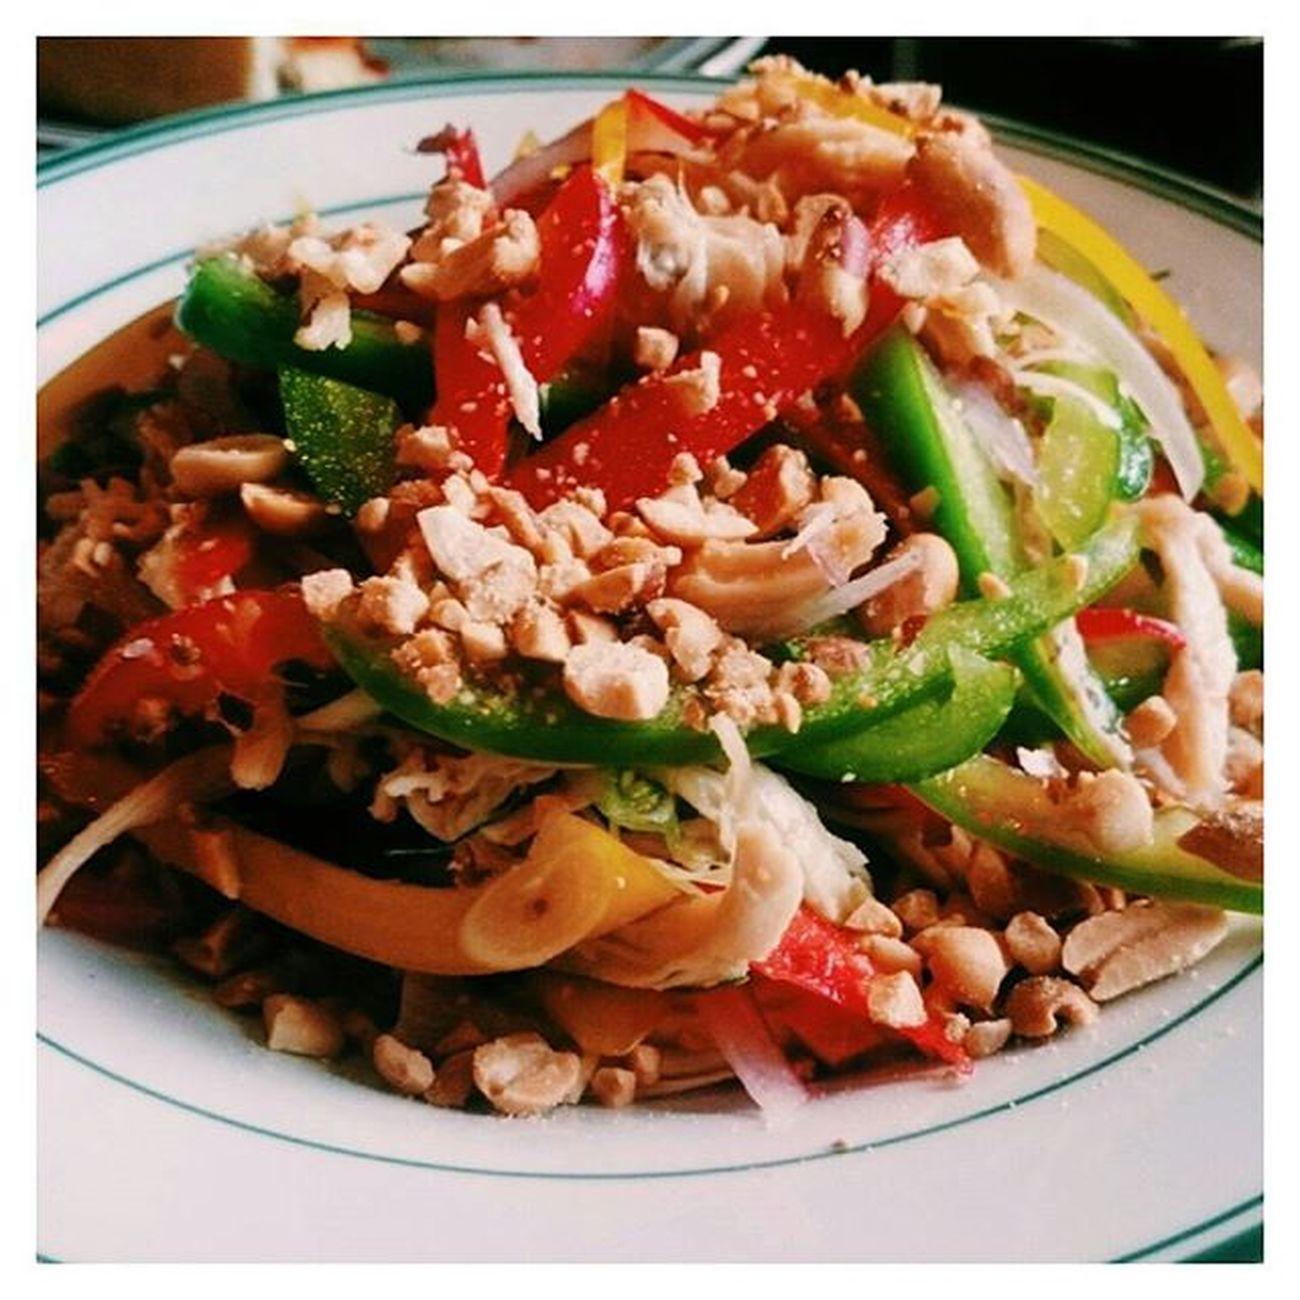 Đi ăn Cowboy Jack's mẩn mê đĩa salad còn hơn cả cái pizza 😝😝😝 Cowboyjacks Salad Yummy Susfoodtrip Lozi Lozihn Lozihanoi Foody Foodyhanoi Zizohanoi Foodporn Foodstagram Foodie Instafood FoodADDICT